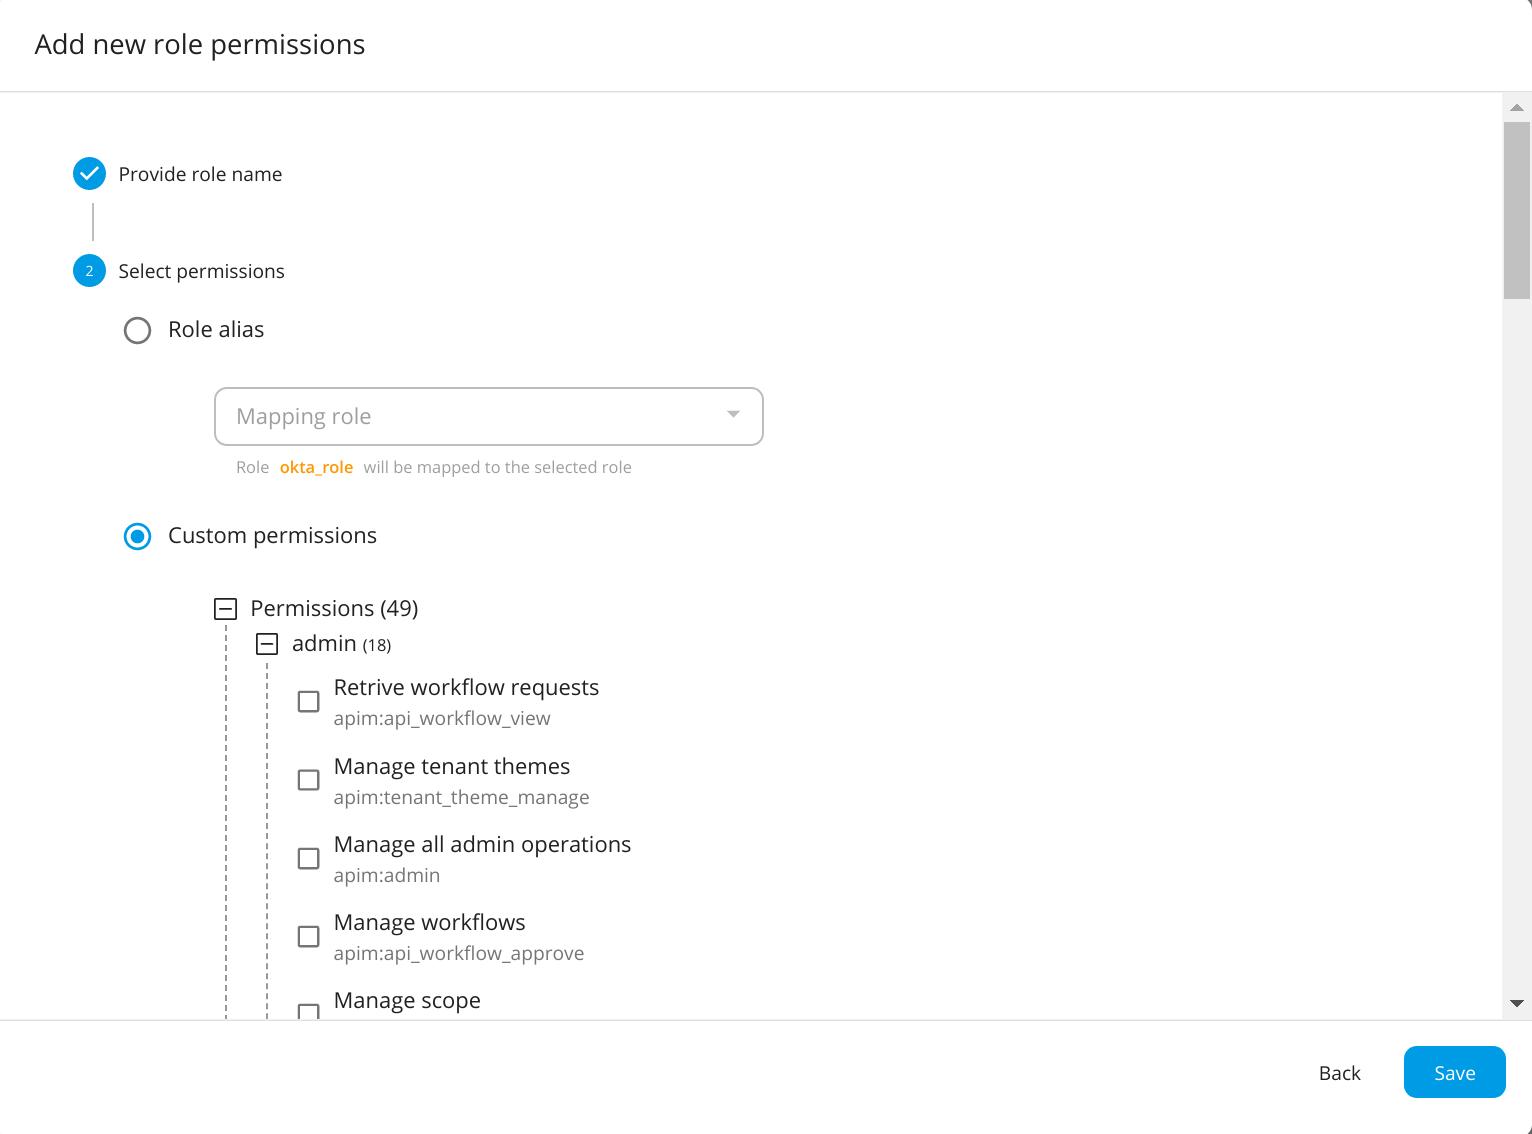 Okta API-M role pemission mapping